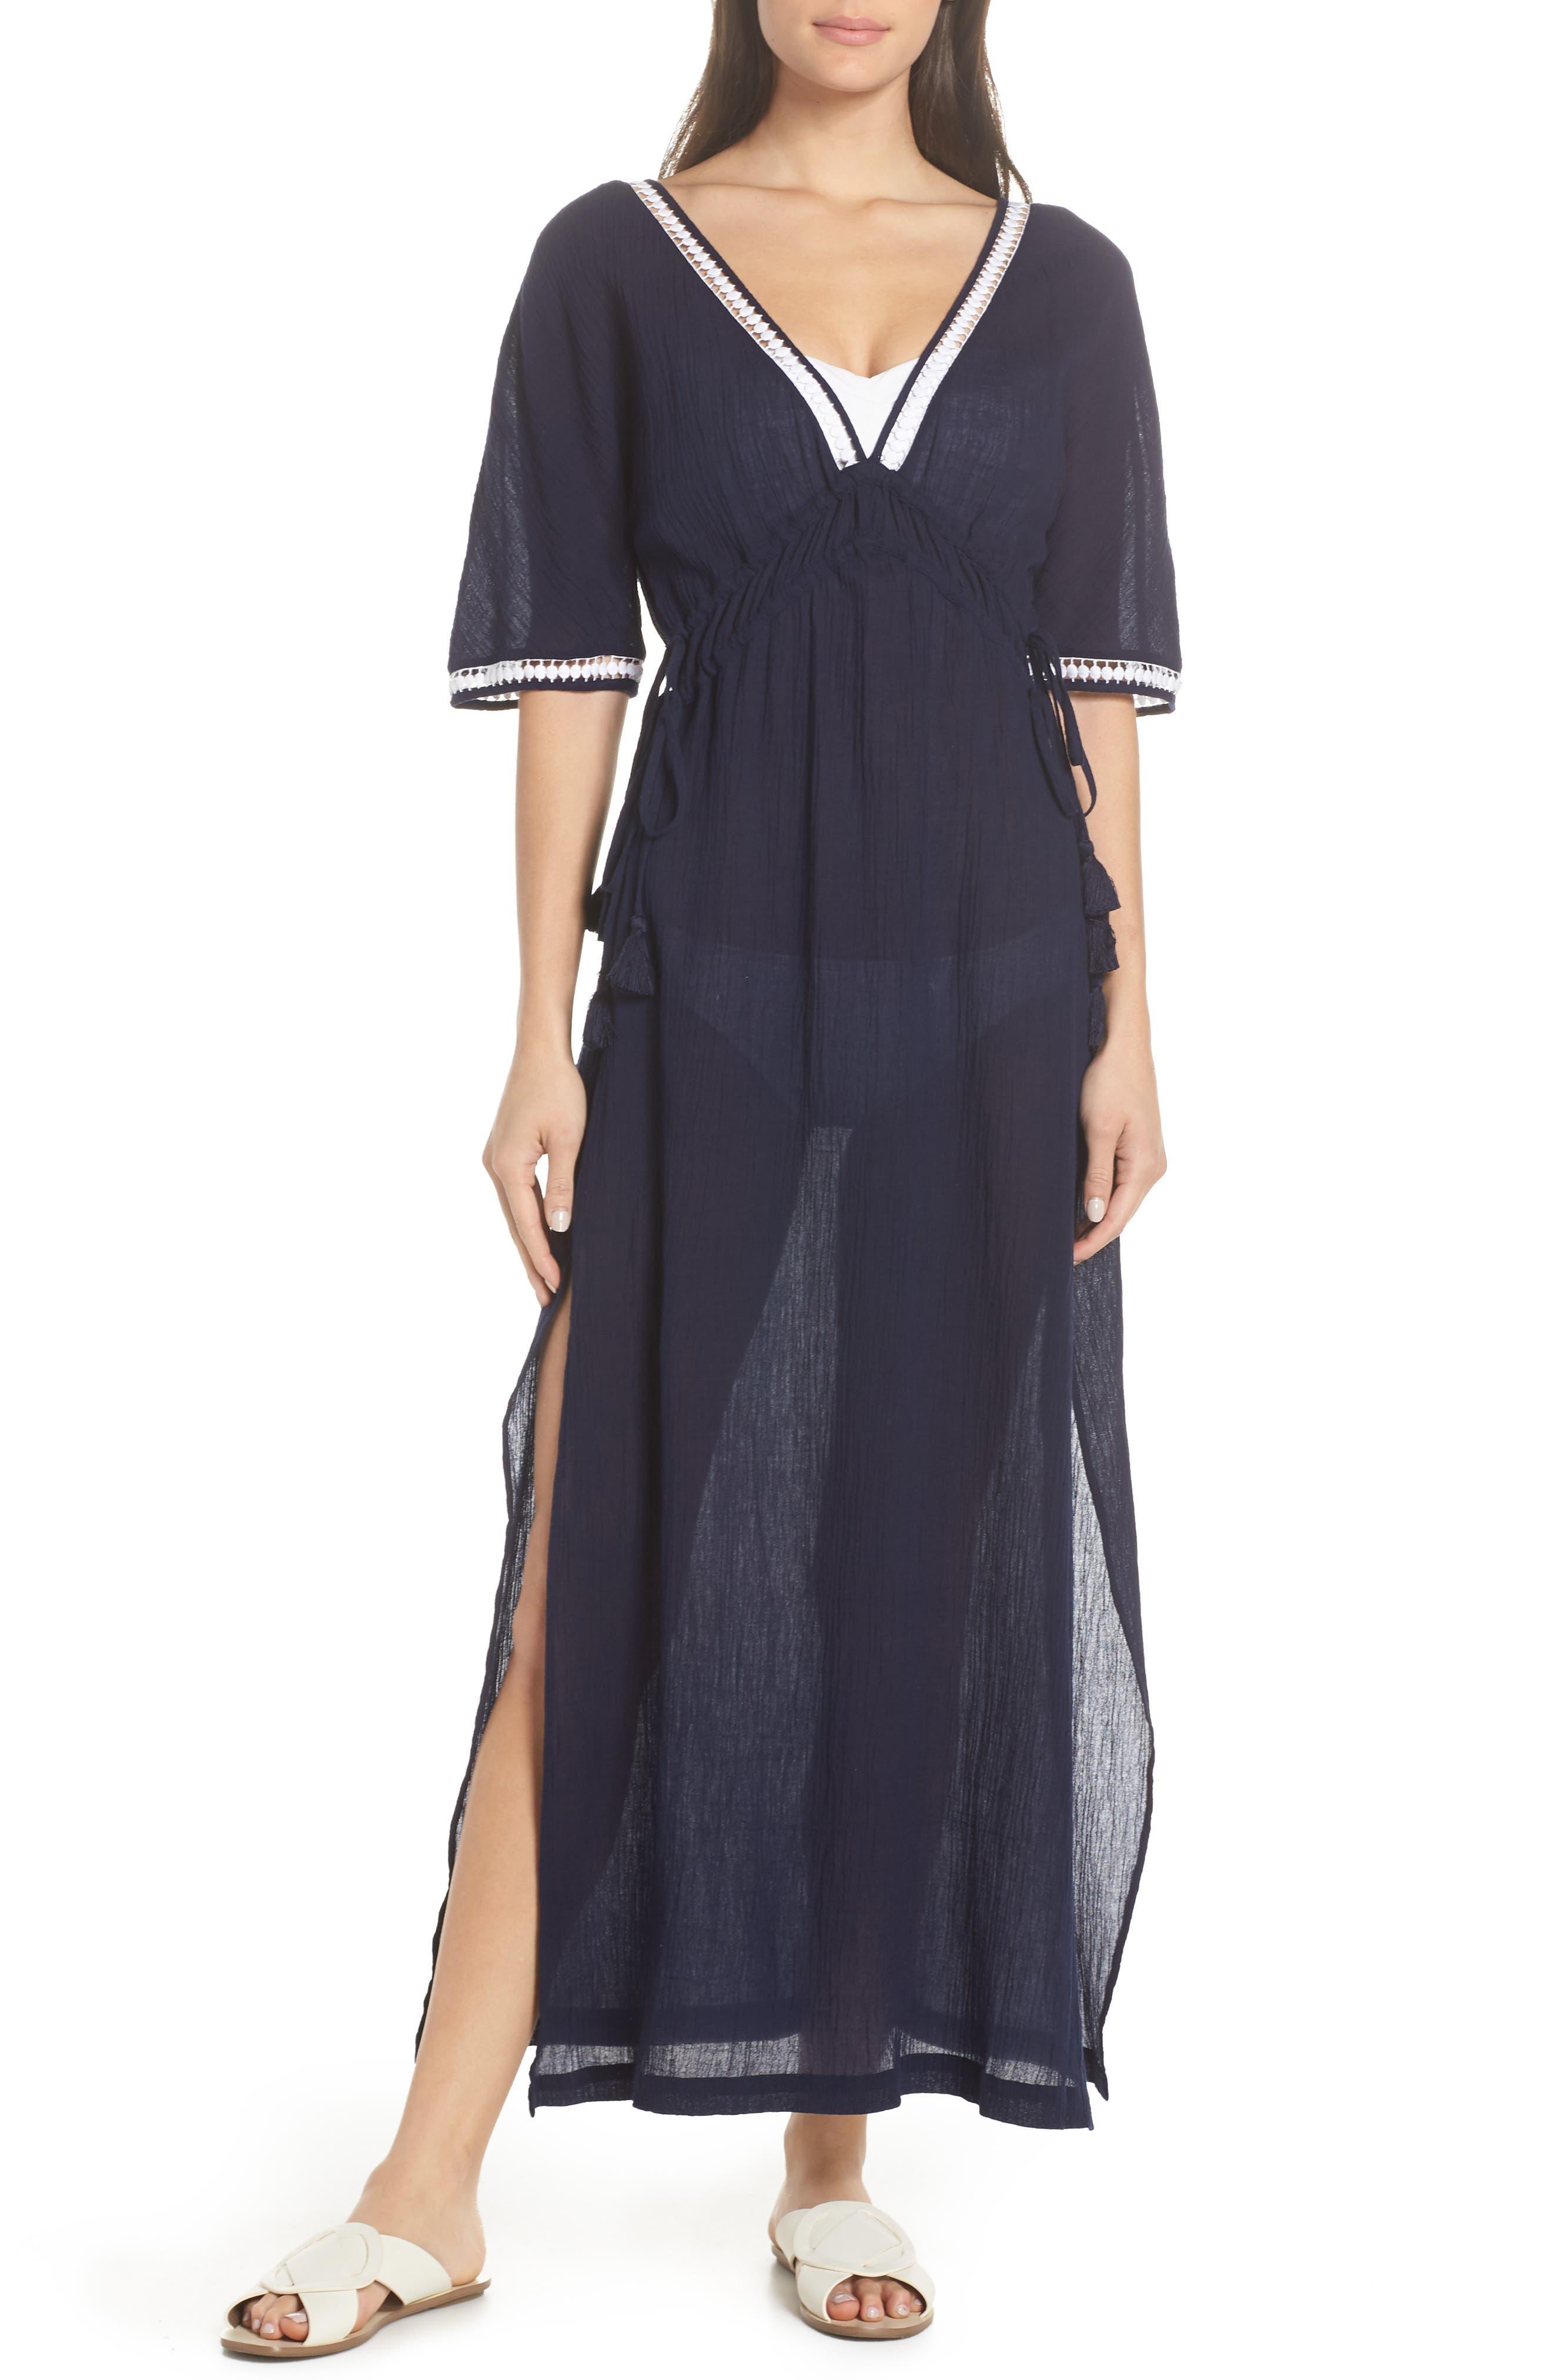 HEIDI KLEIN Carlisle Bay Lace-Trim Coverup Maxi Dress in Navy